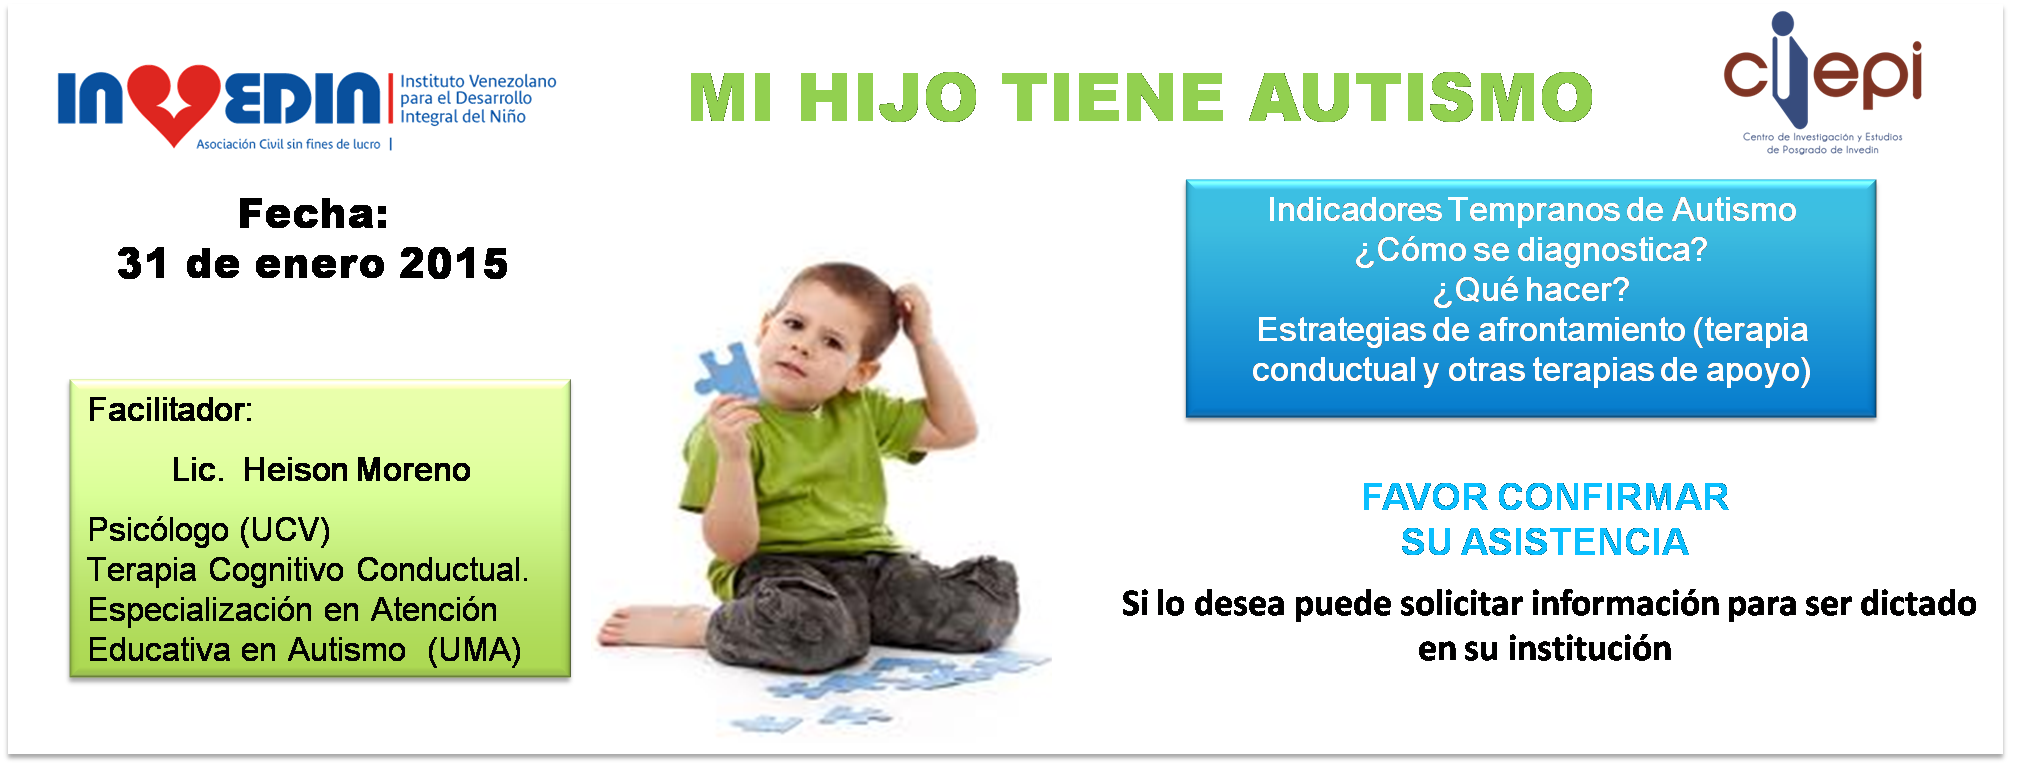 Taller: Mi hijo tiene autismo